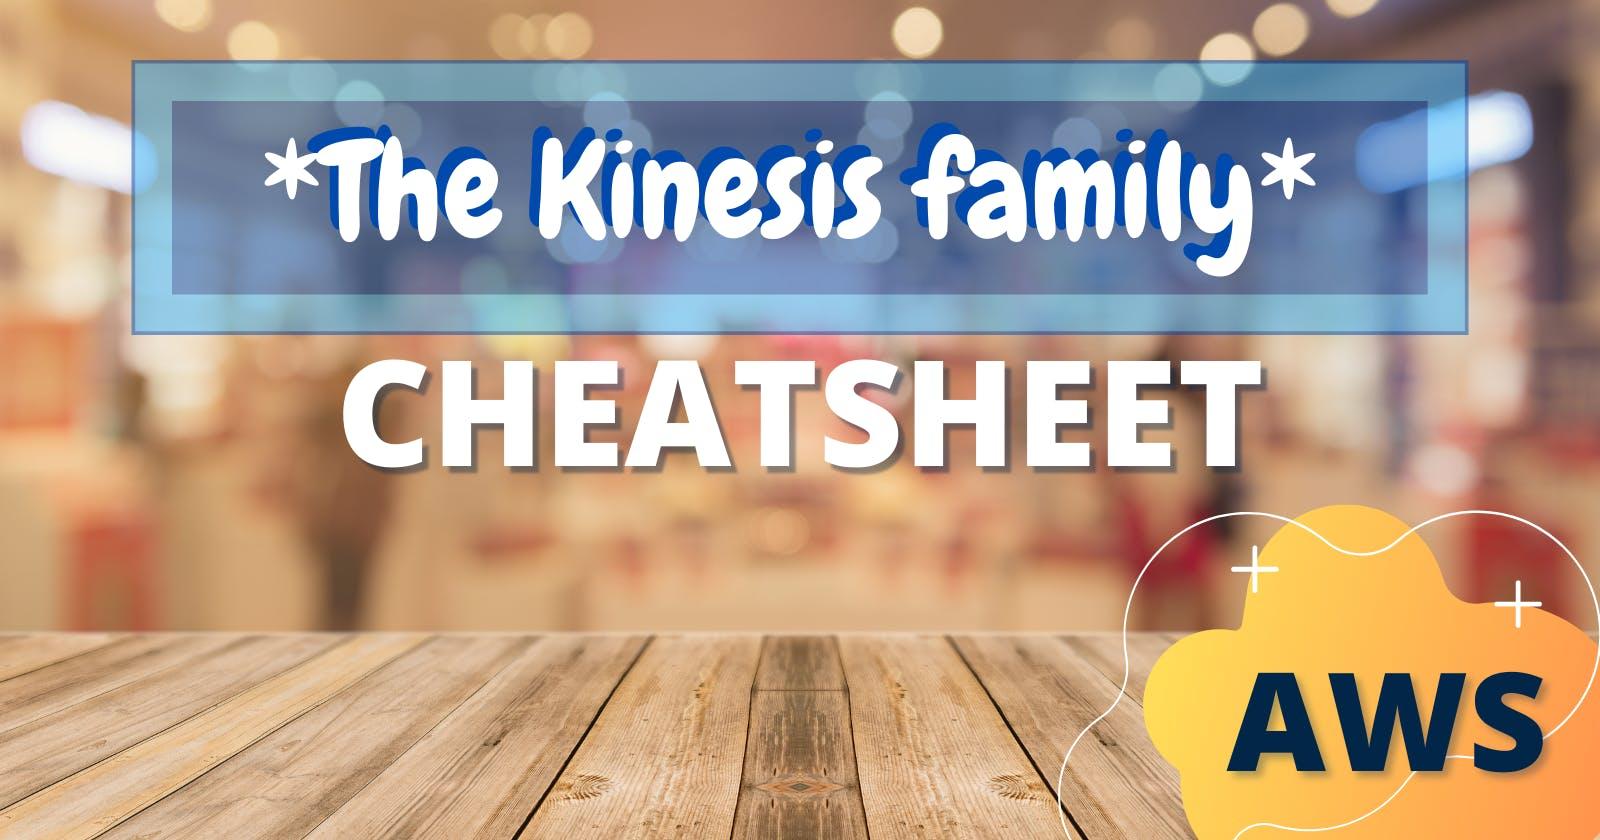 The Kinesis family Cheat Sheet